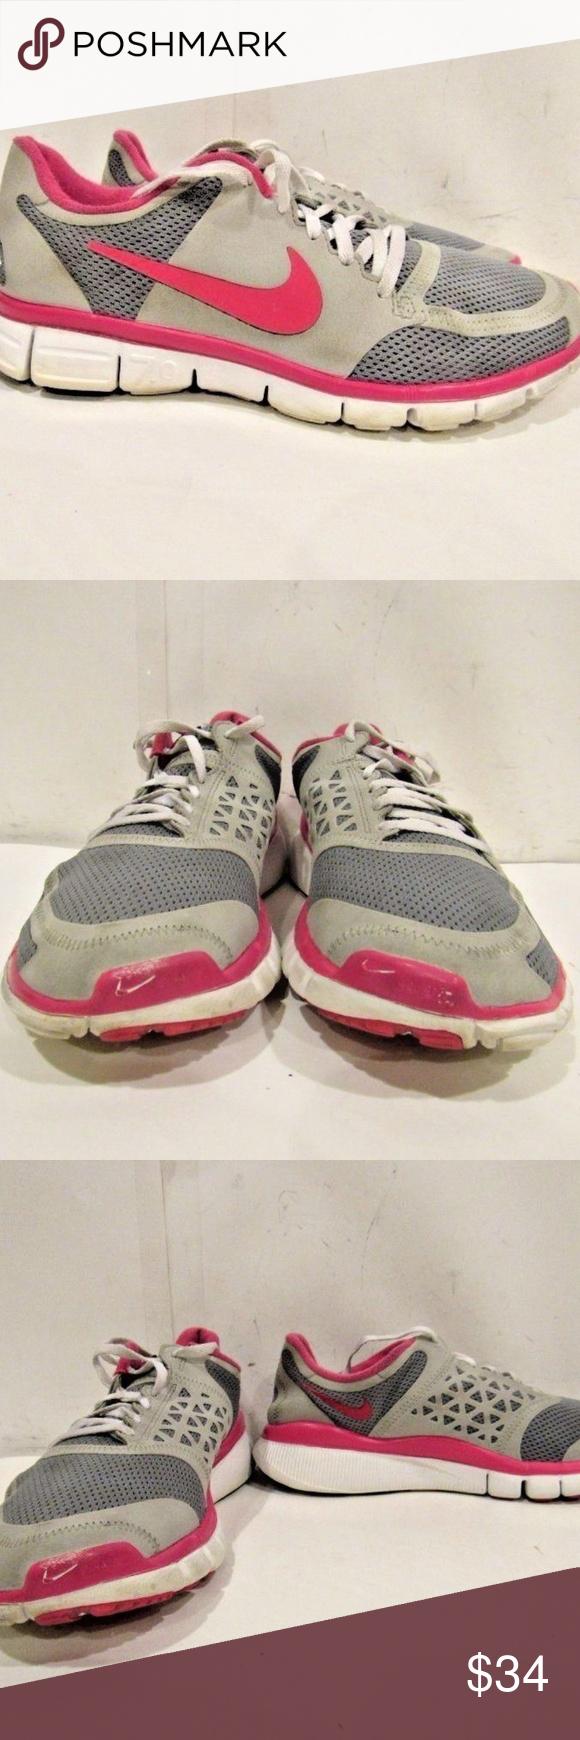 48ea8194a22fb NIKE FREE 7.0 Size 10 Running Sneaker Shoes Women NIKE FREE 7.0 Size 10M  Gray